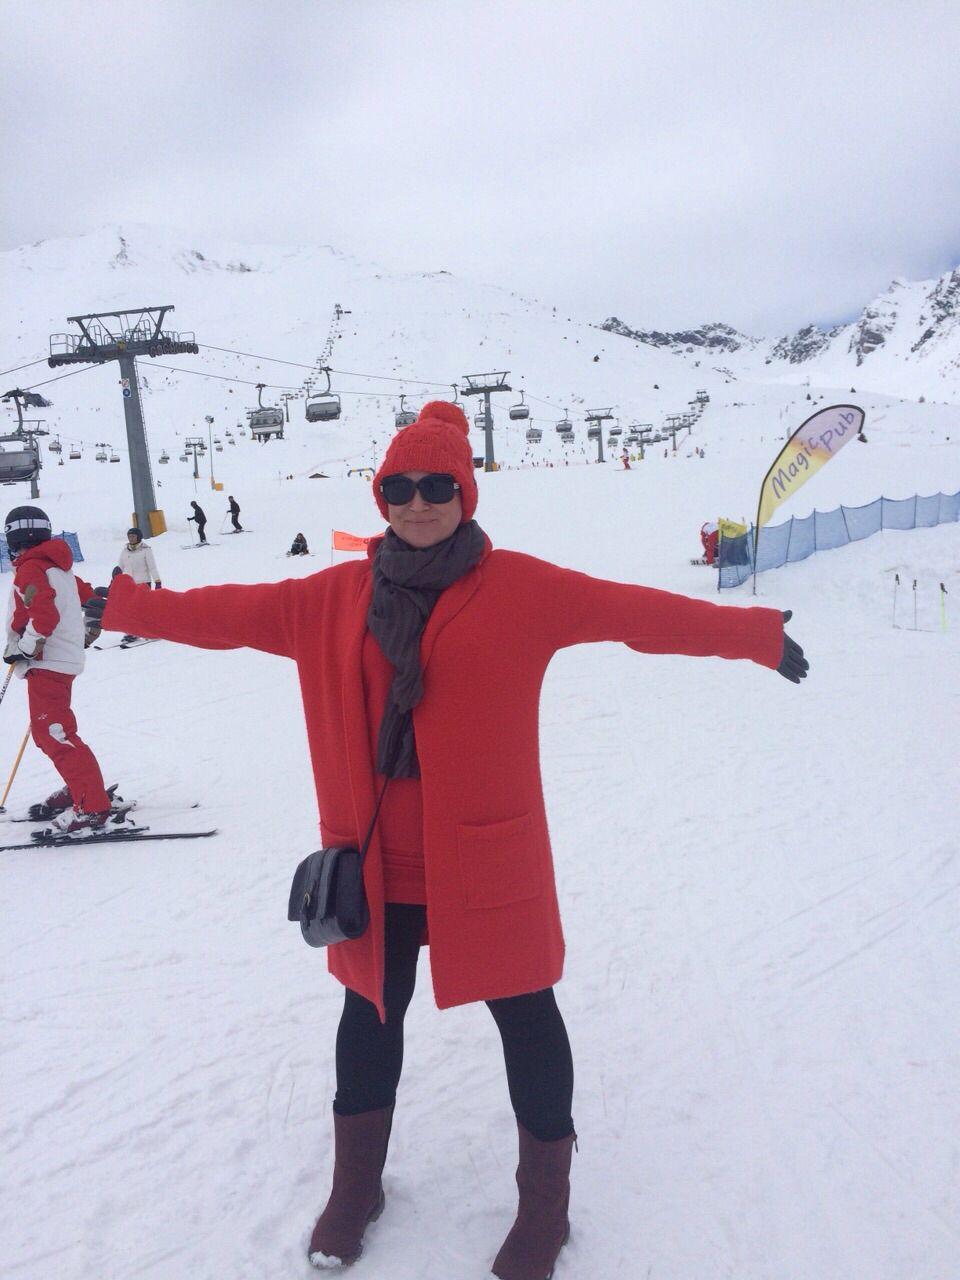 Après ski orange hat